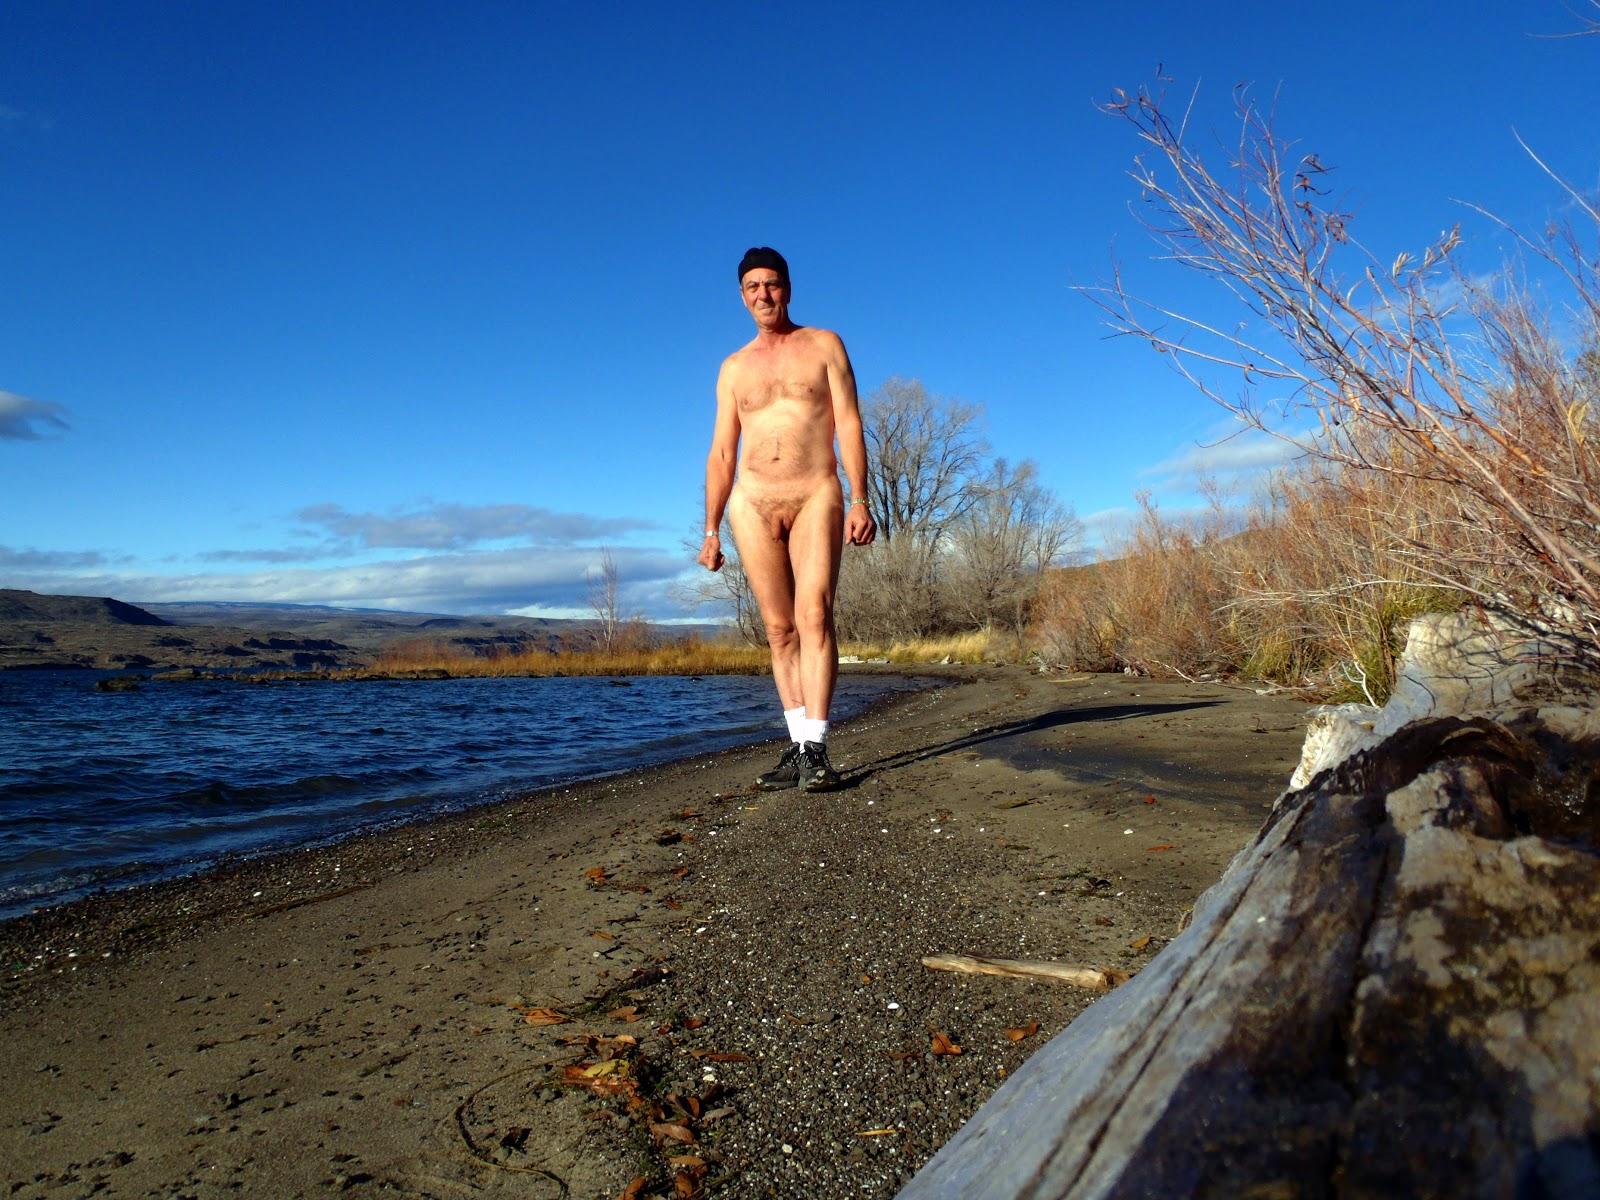 Nude Beach Washington State